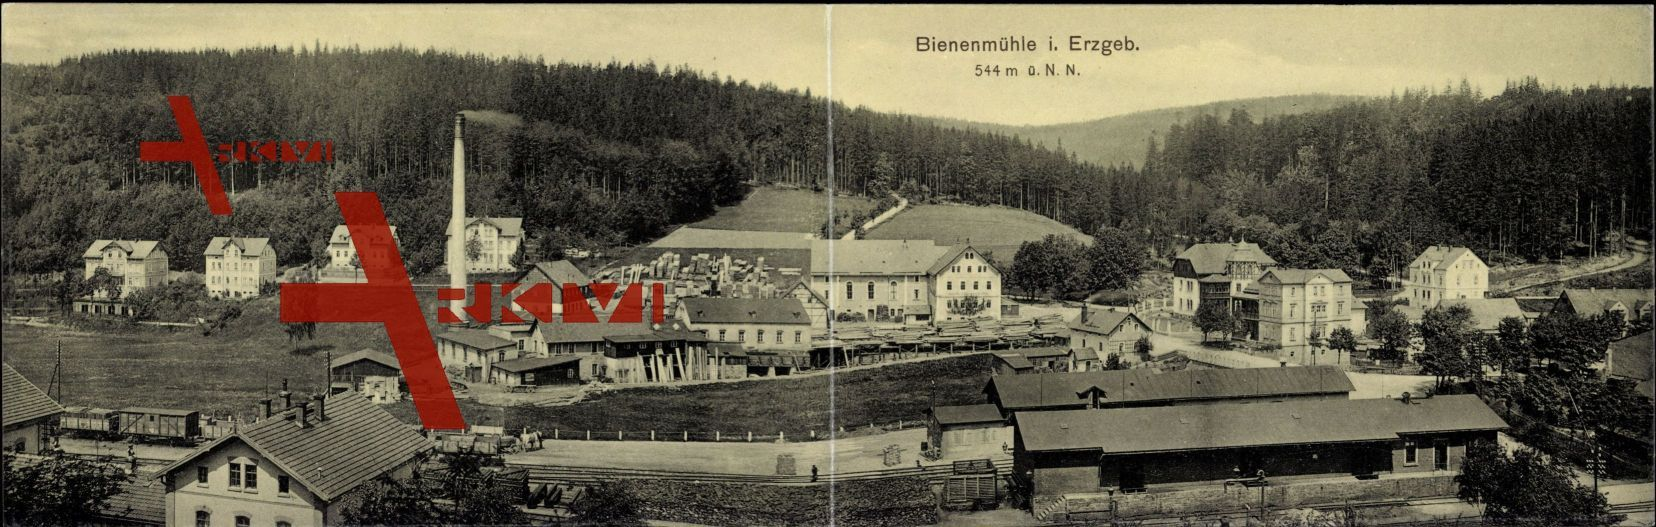 Klapp Rechenberg Bienenmühle Erzgebirge, Fabrik